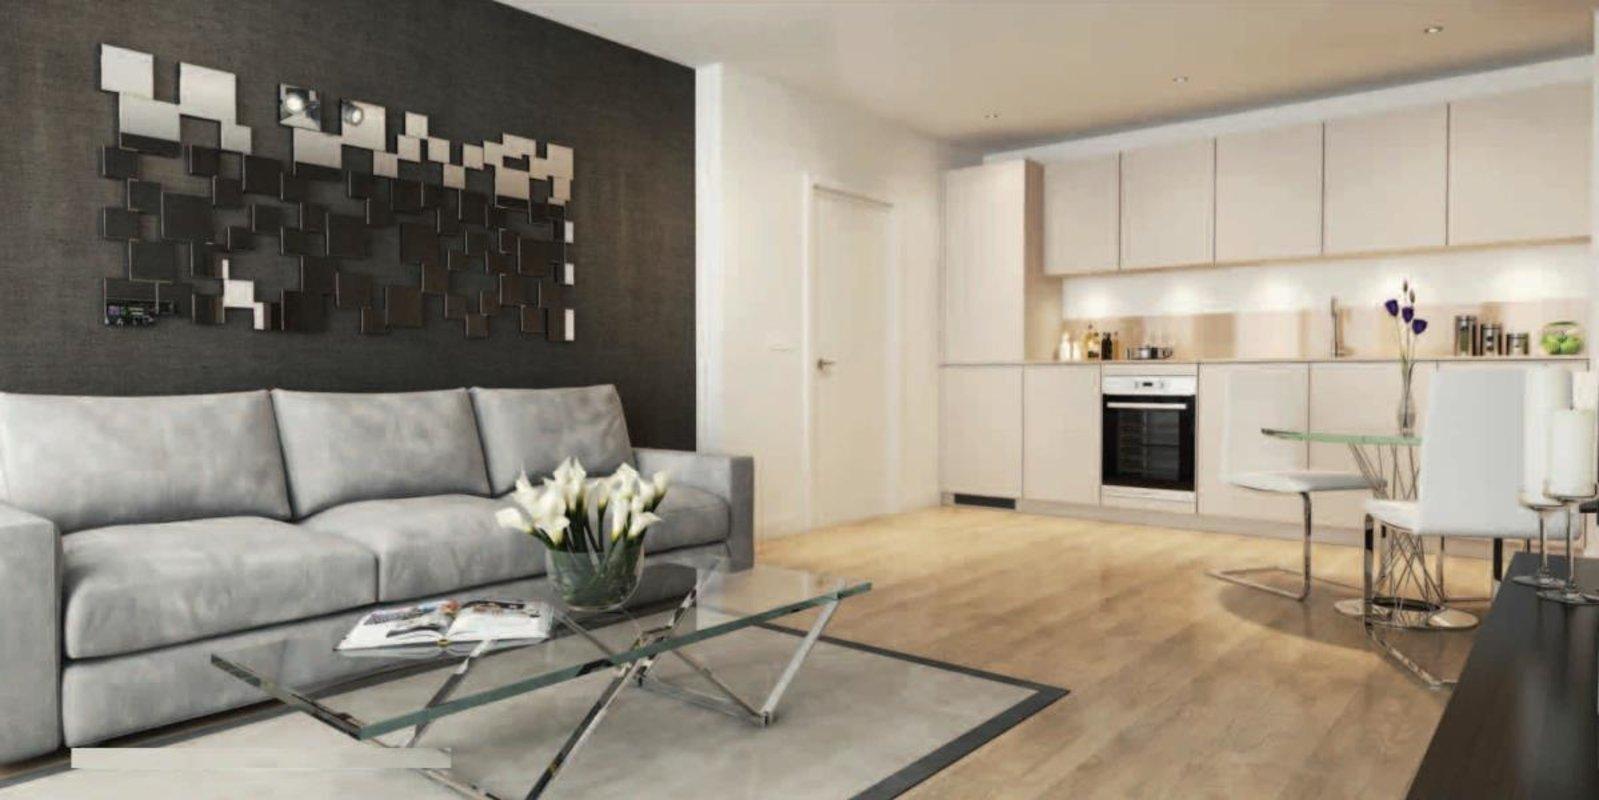 Apartment-under-offer-Stratford-london-1451-view5